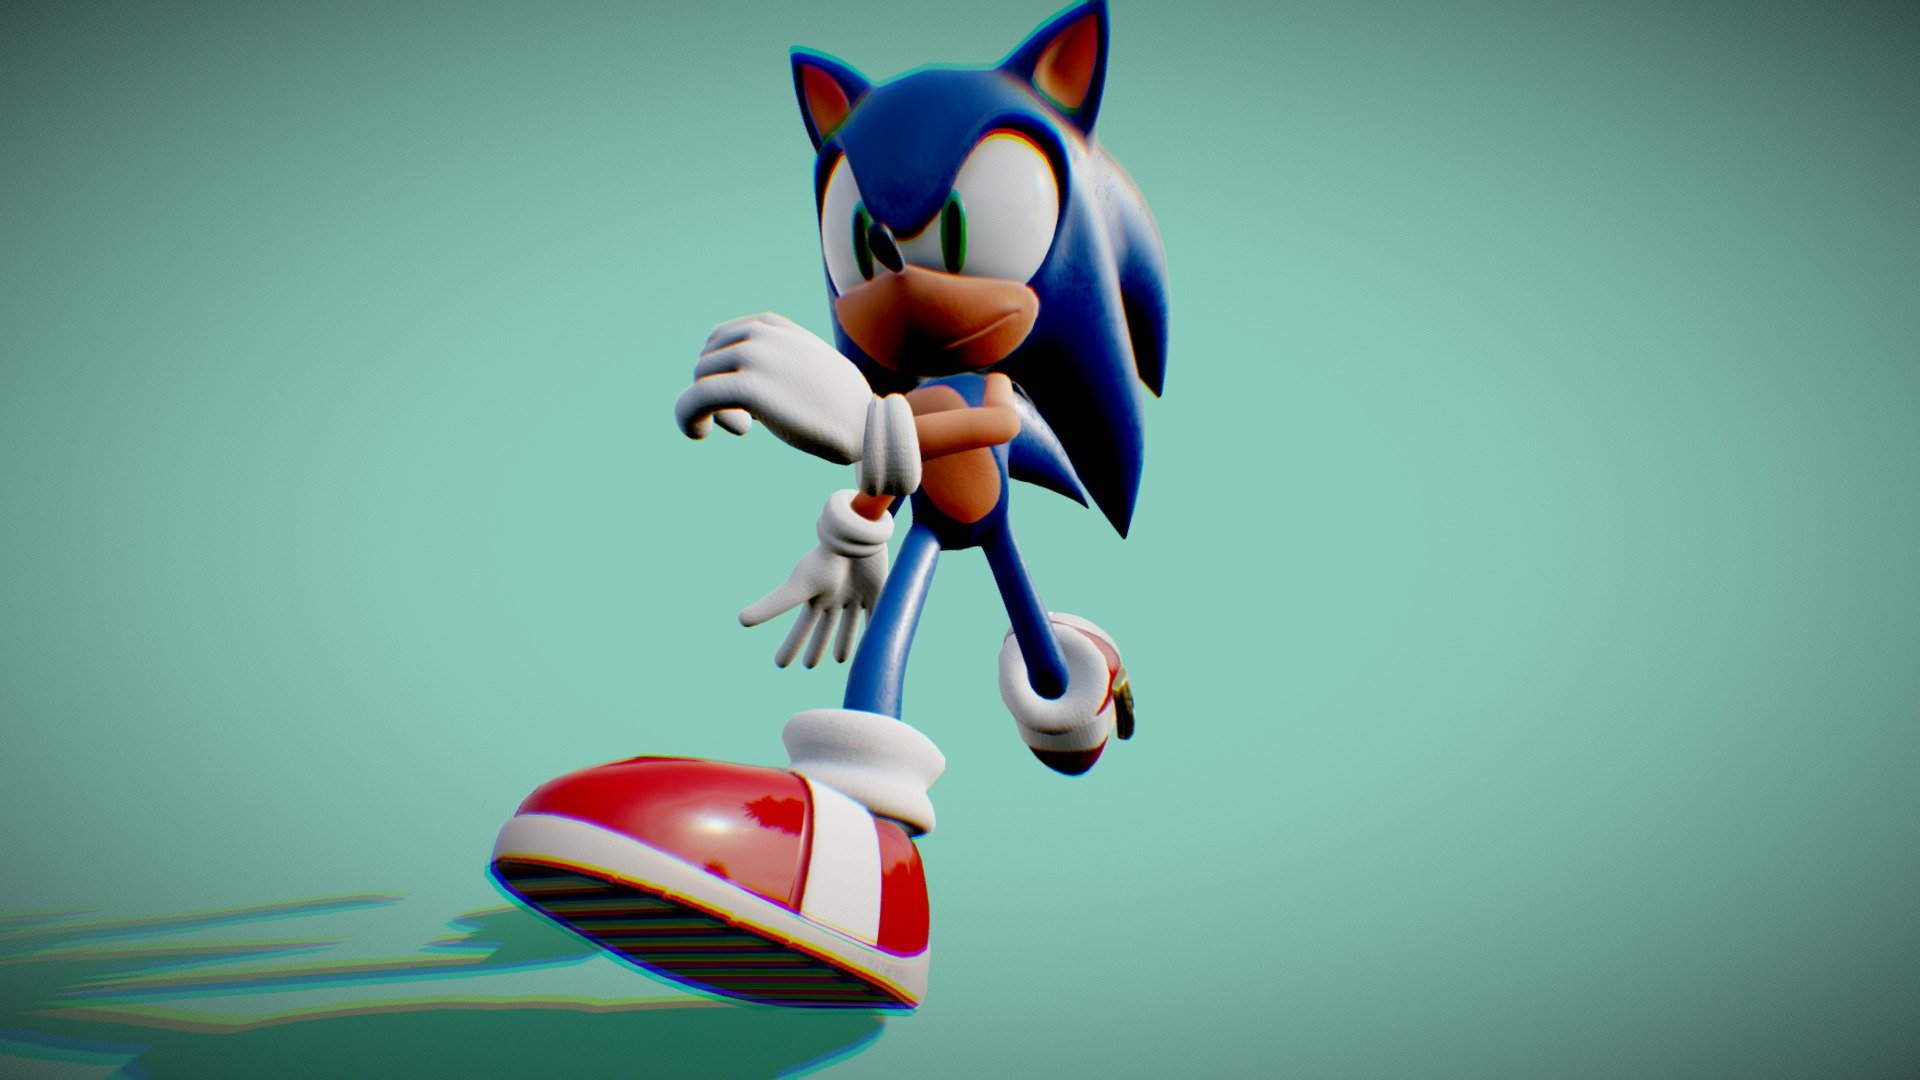 Sonic Running Test 3d Model By Miguel Valverde Miguelvalverde 39a052f Sketchfab